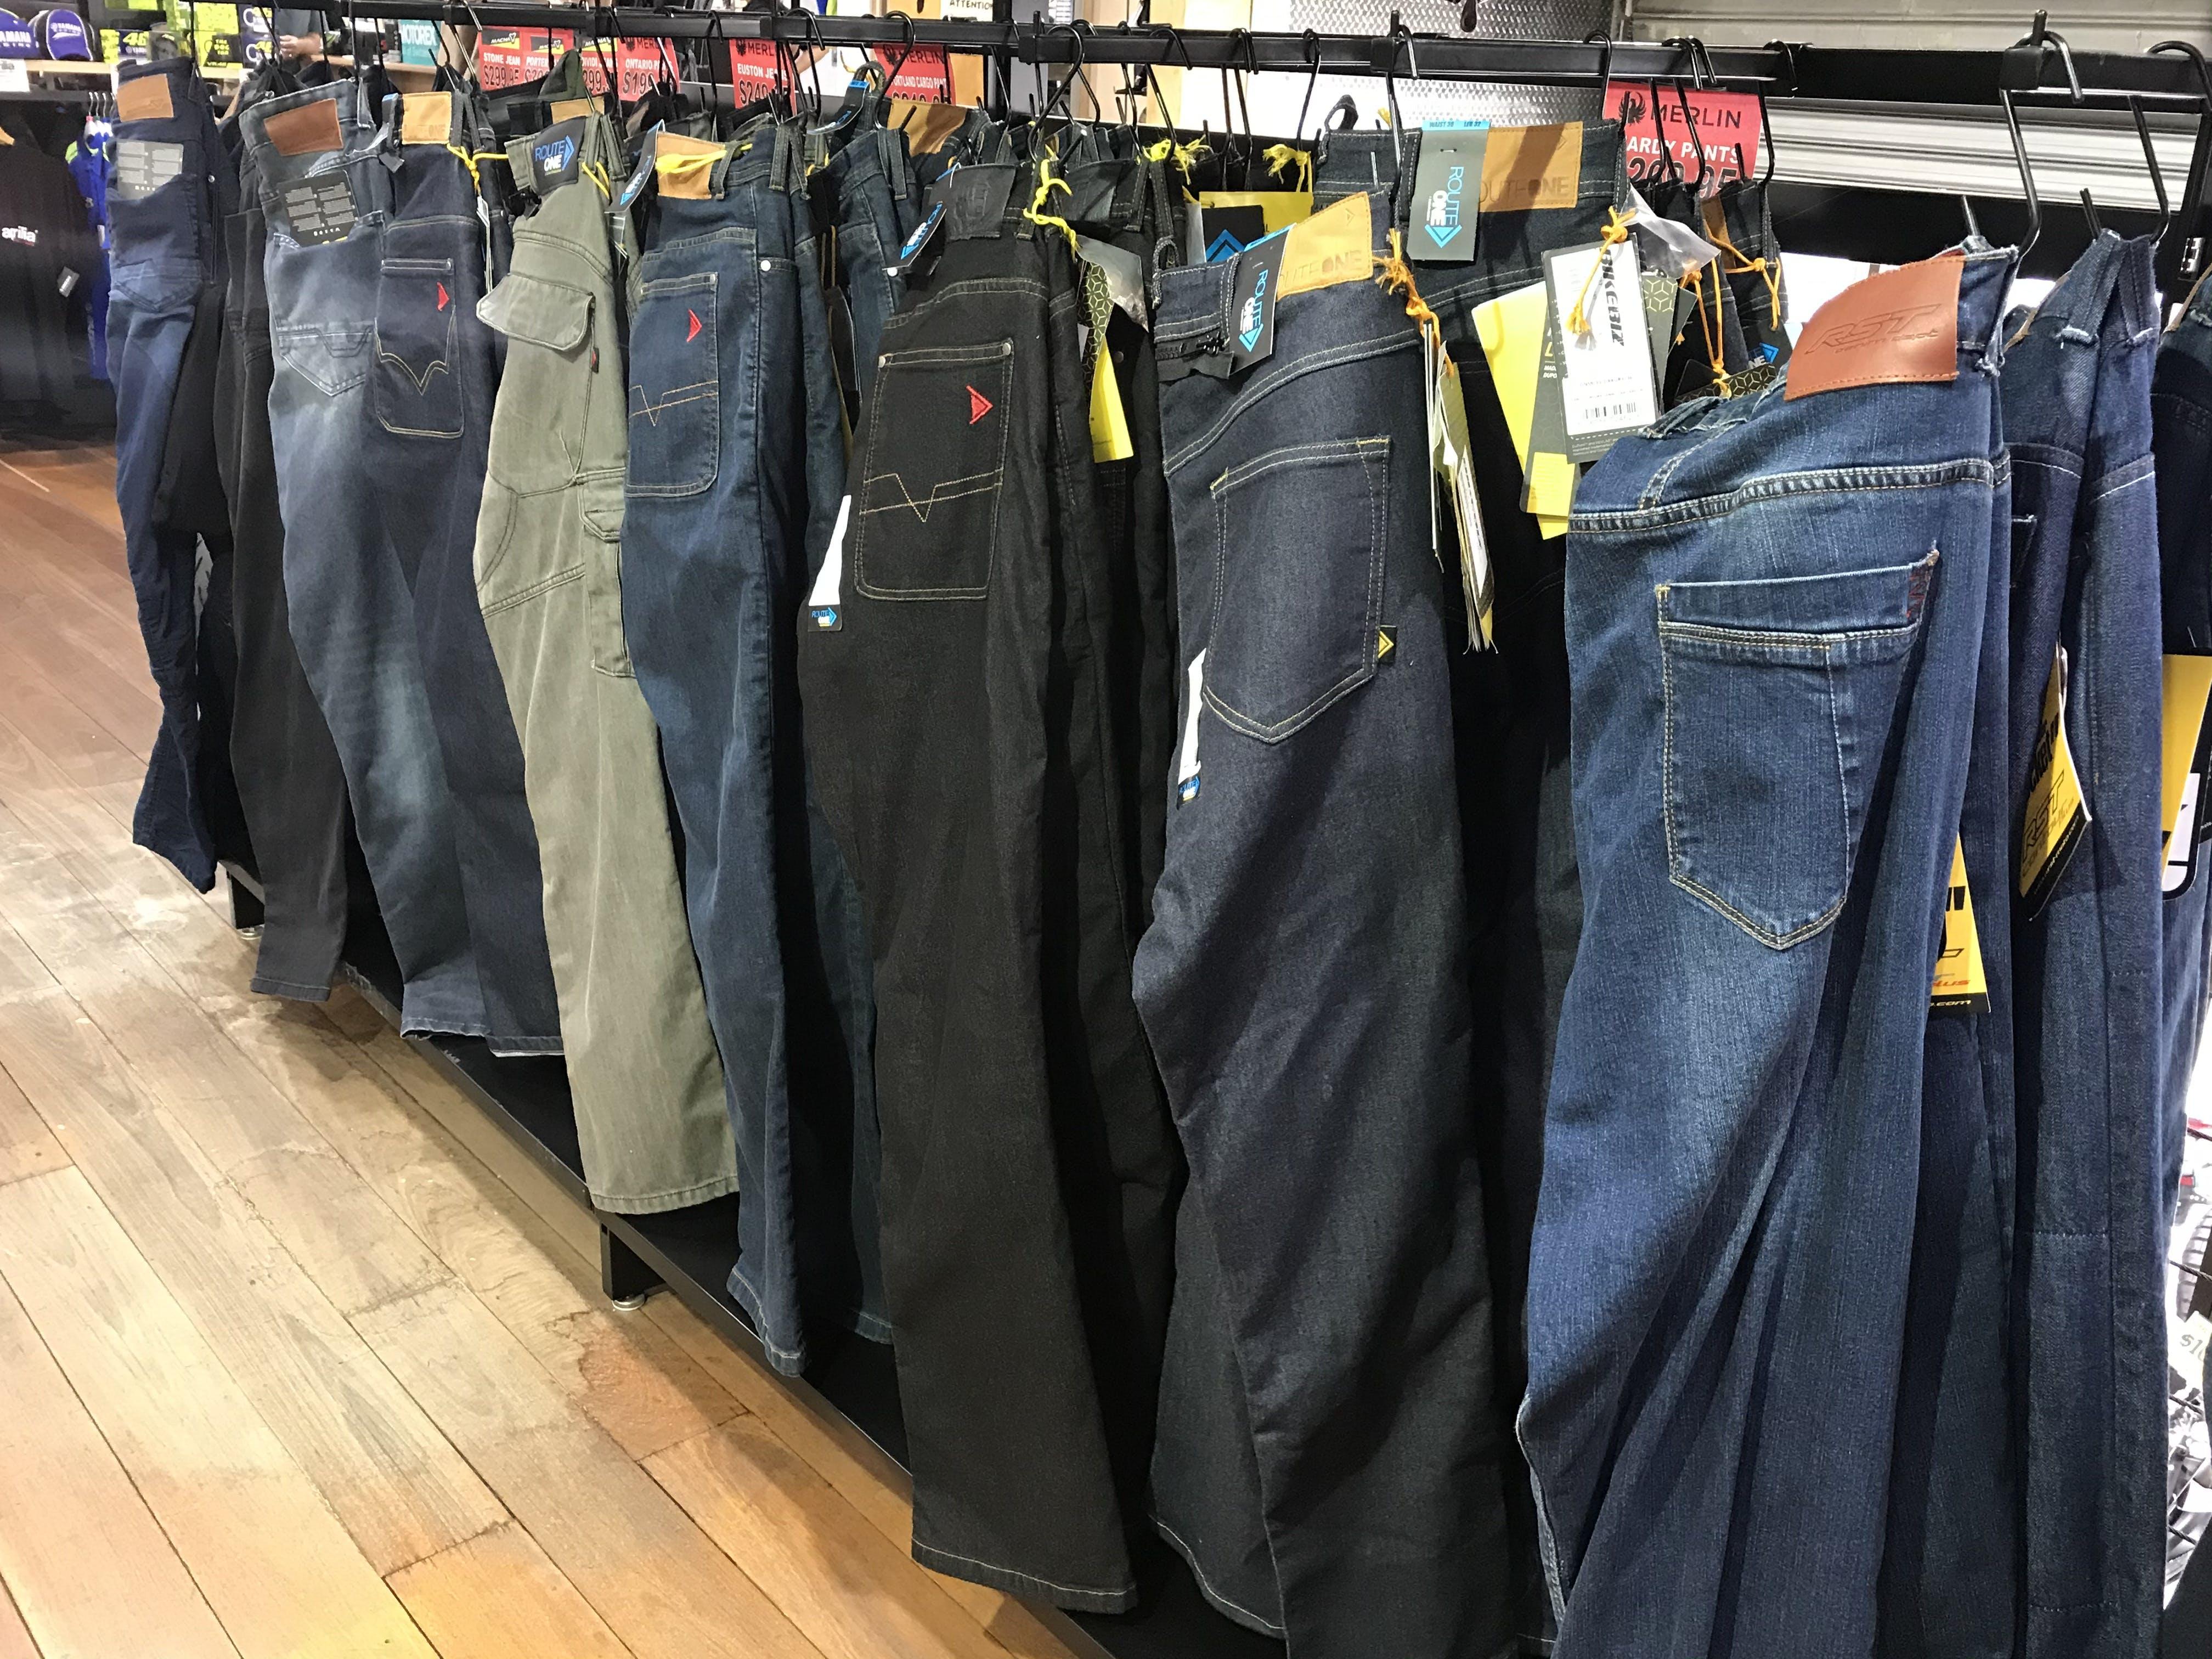 Merlin and Macna Kelvar jeans in store at Bikebiz